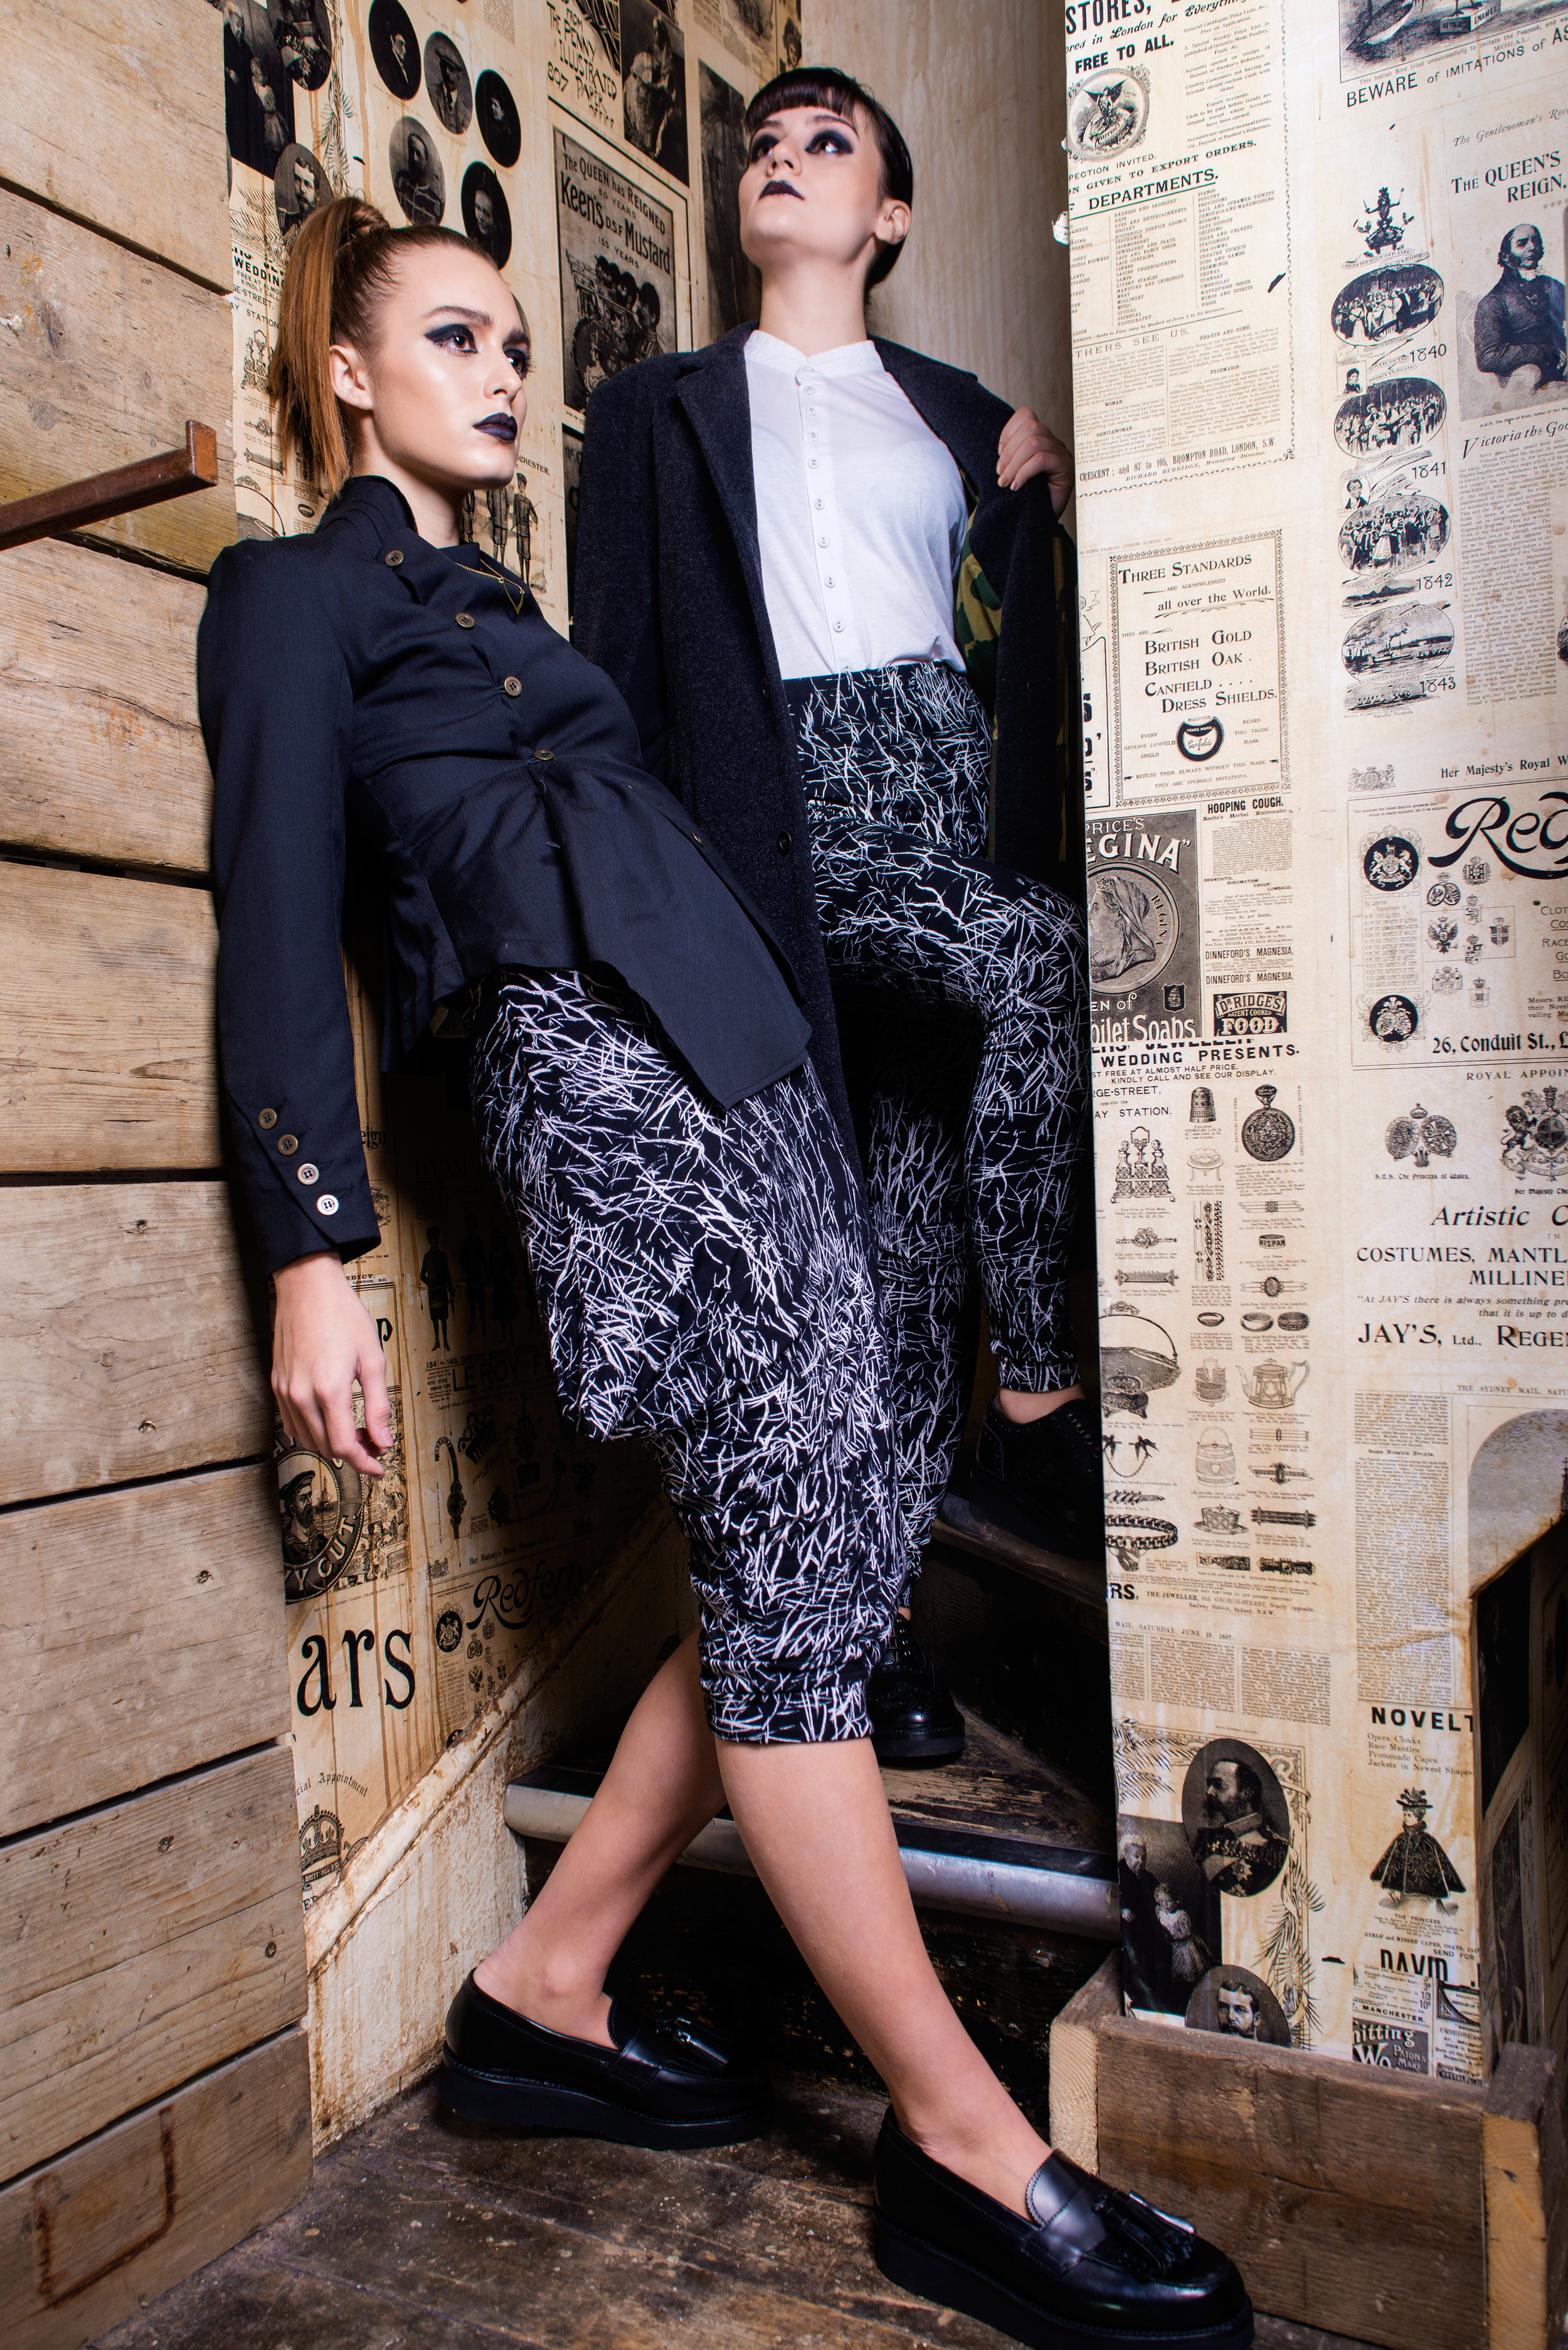 zaramia-ava-zaramiaava-leeds-fashion-designer-ethical-sustainable-tailored-minimalist-jacket-mio-mai-coat-jacket-print-shirt-trousers-top-versatile-drape-cowl-styling-shop-womenswear-1